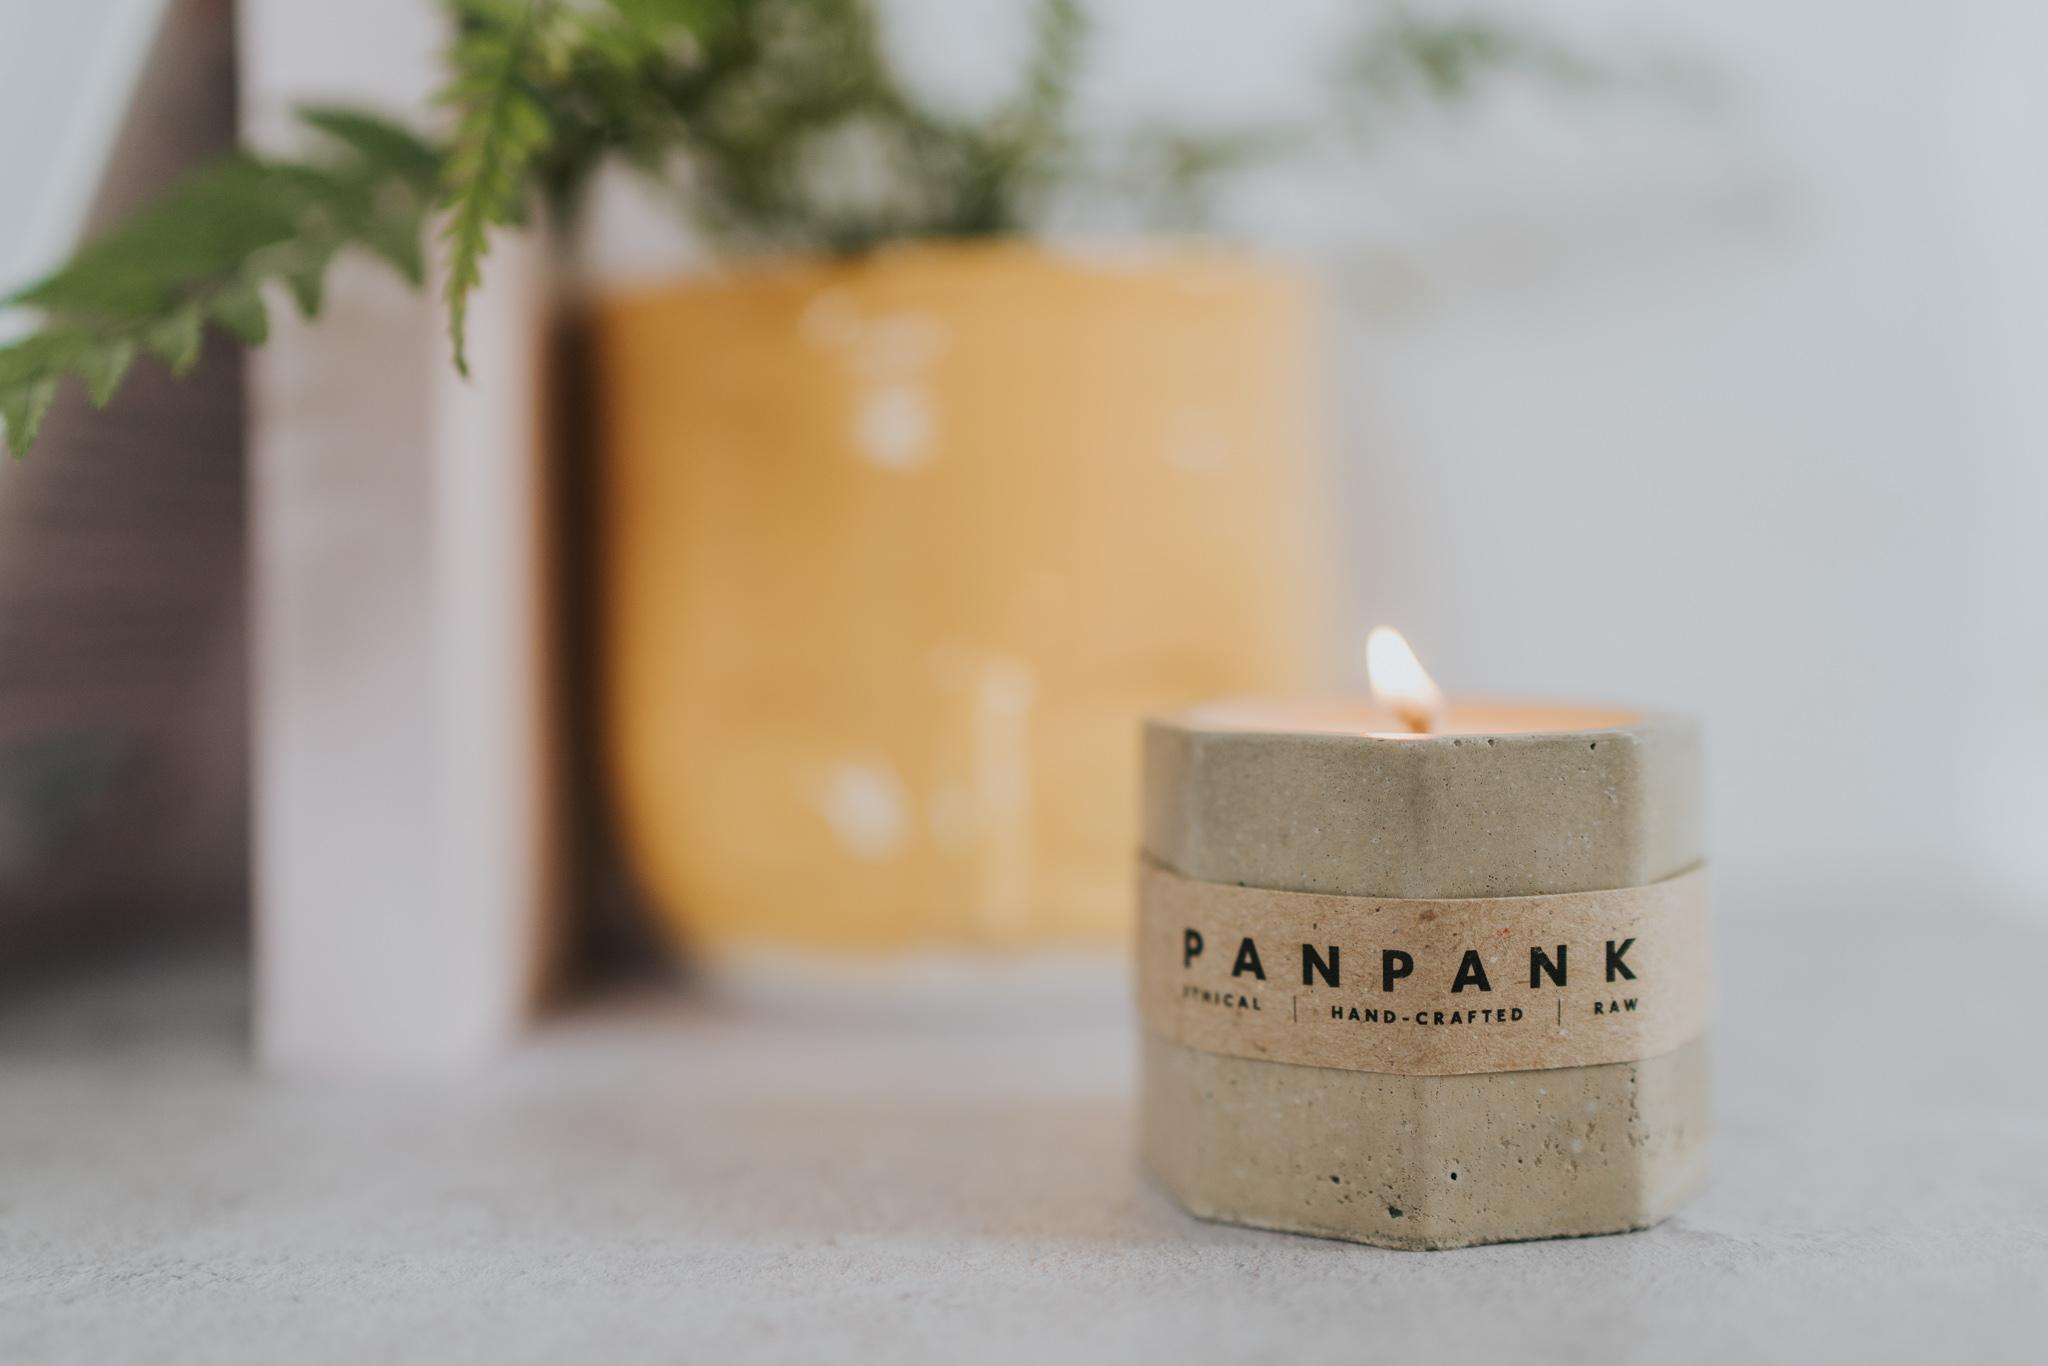 business-branding-panpank-candles-grace-elizabeth-colchester-essex-devon-suffolk-and-norfolk-alternative-wedding-and-family-photographer (13 of 19).jpg